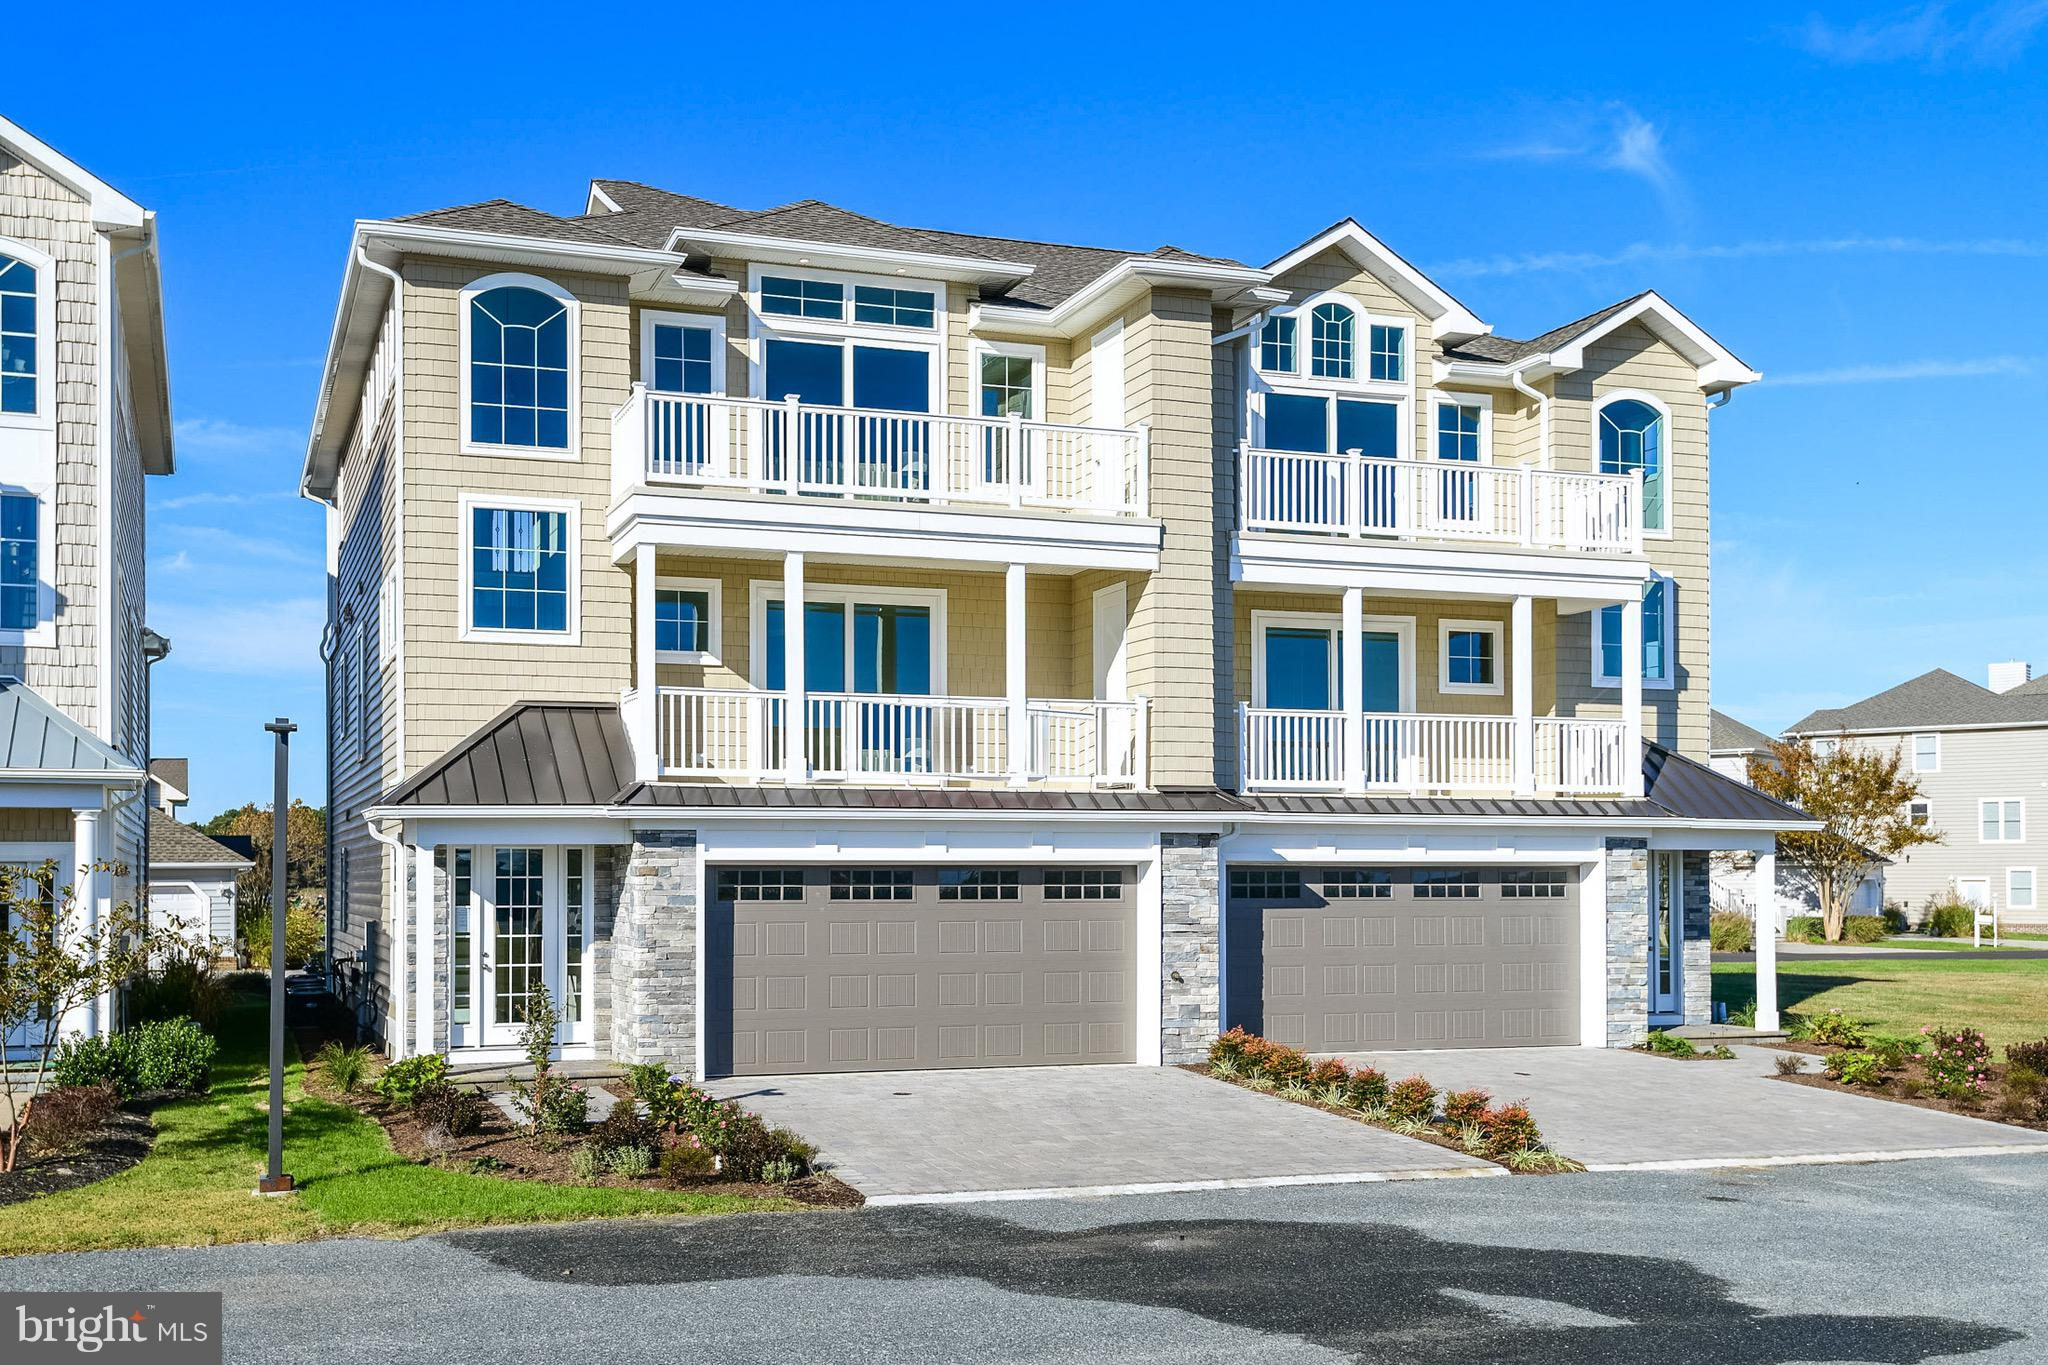 NEW CONSTRUCTION, The PLANTATIONS - Ocean City, Prestiges Development - 14 Townhouse Community, 5uni